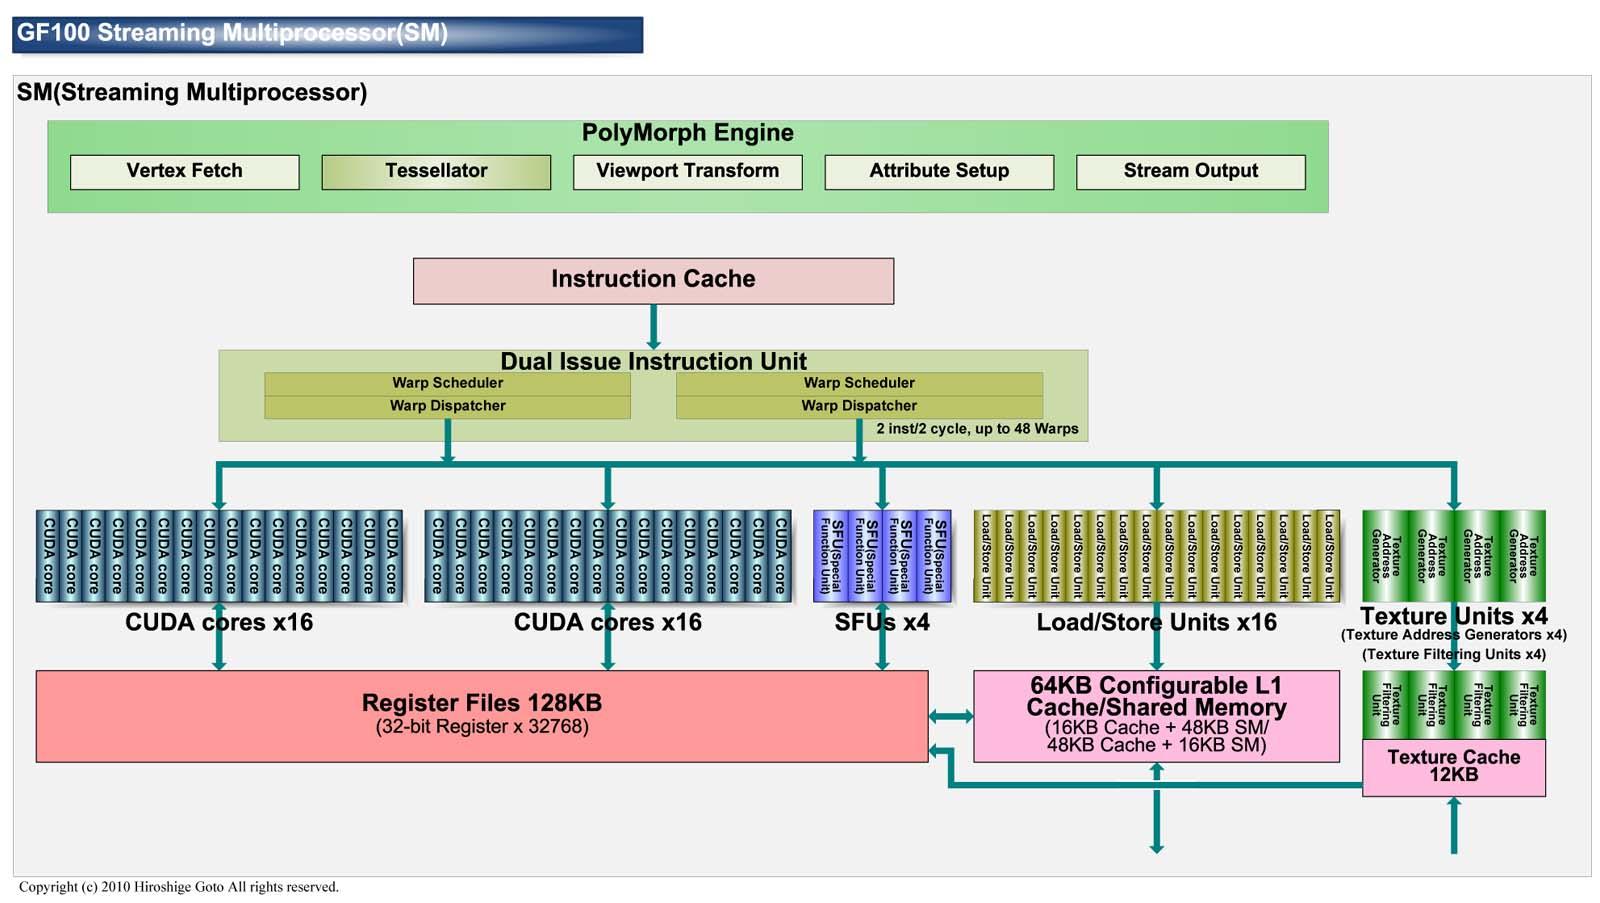 "GF100 Streaming Multiprocessor<br>PDF版は<a ipw_linktype=""filelink_raw"" ipw_id=""651322"" href=""/video/pcw/docs/359/423/02p.pdf"">こちら</a>"